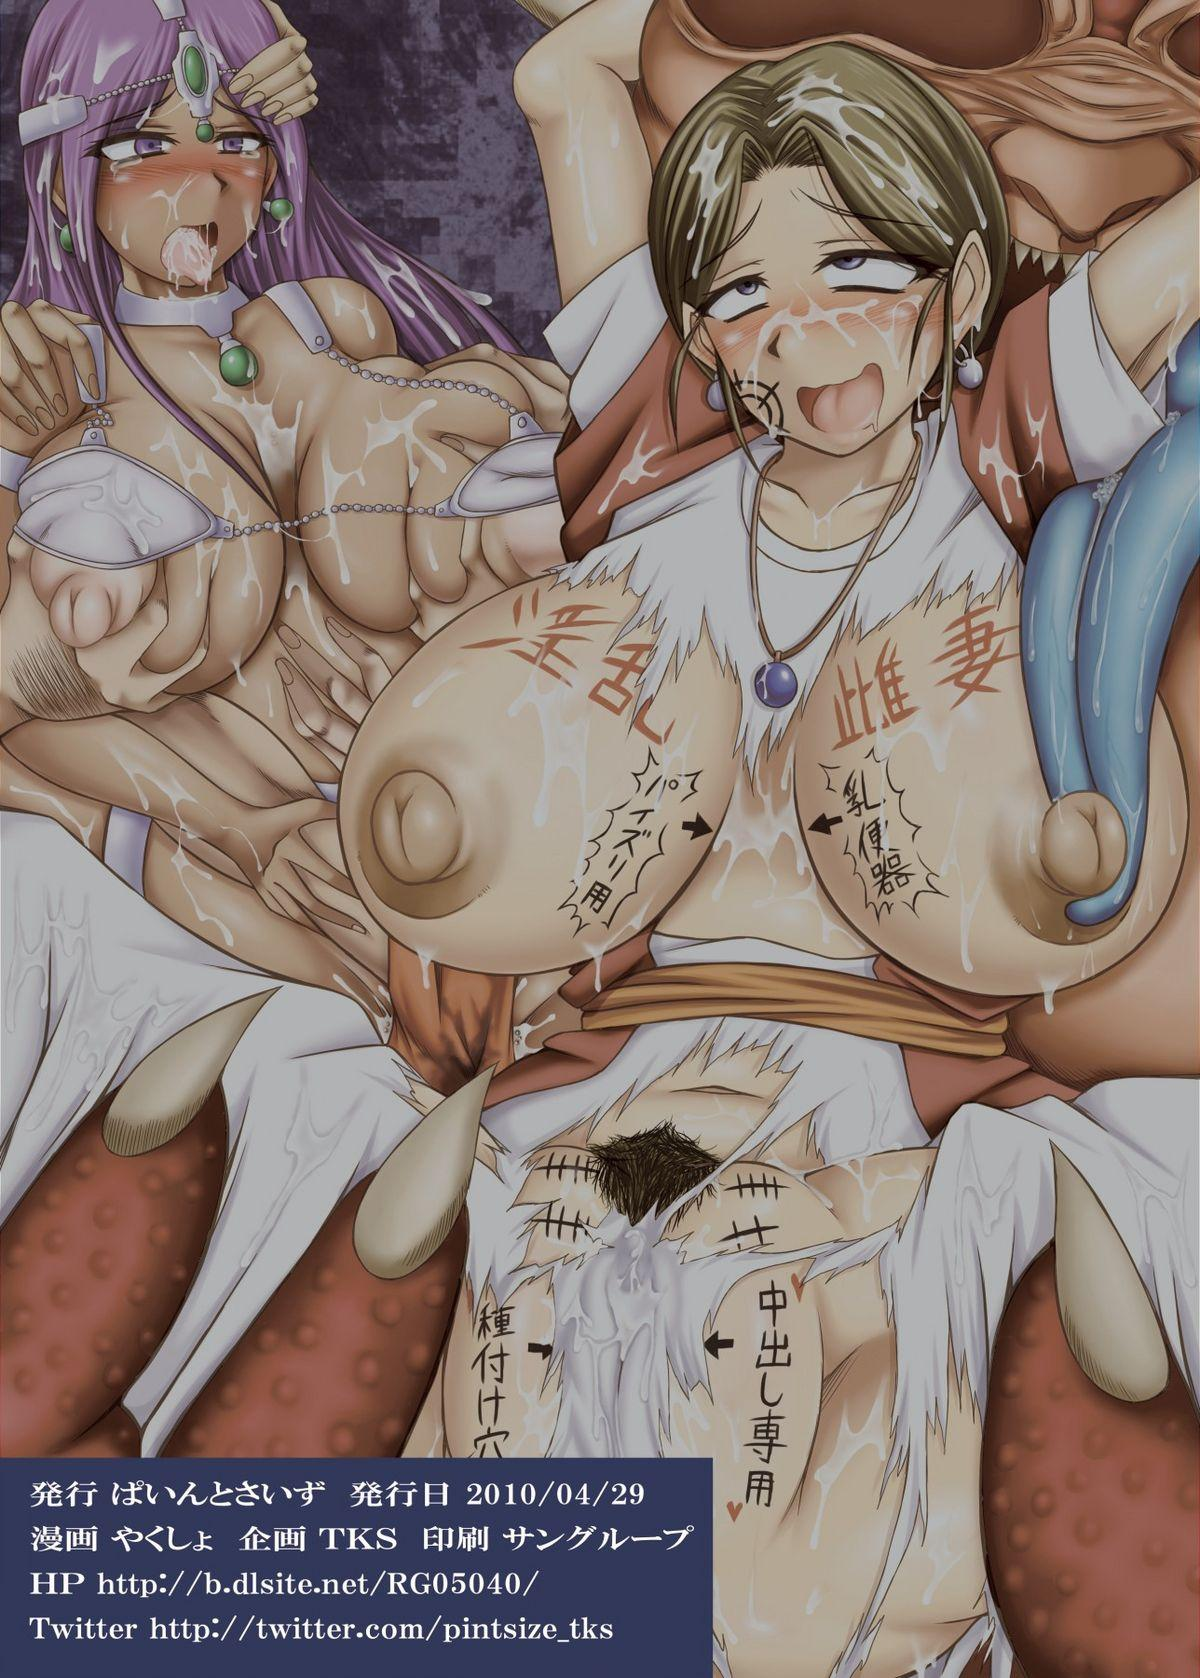 (COMIC1☆4) [Pint Size (Yakusho)] Toruneko Fujin Nene(36) Inran Bakunyu Mesuduma Manya Soe (Dragon Quest IV) 27